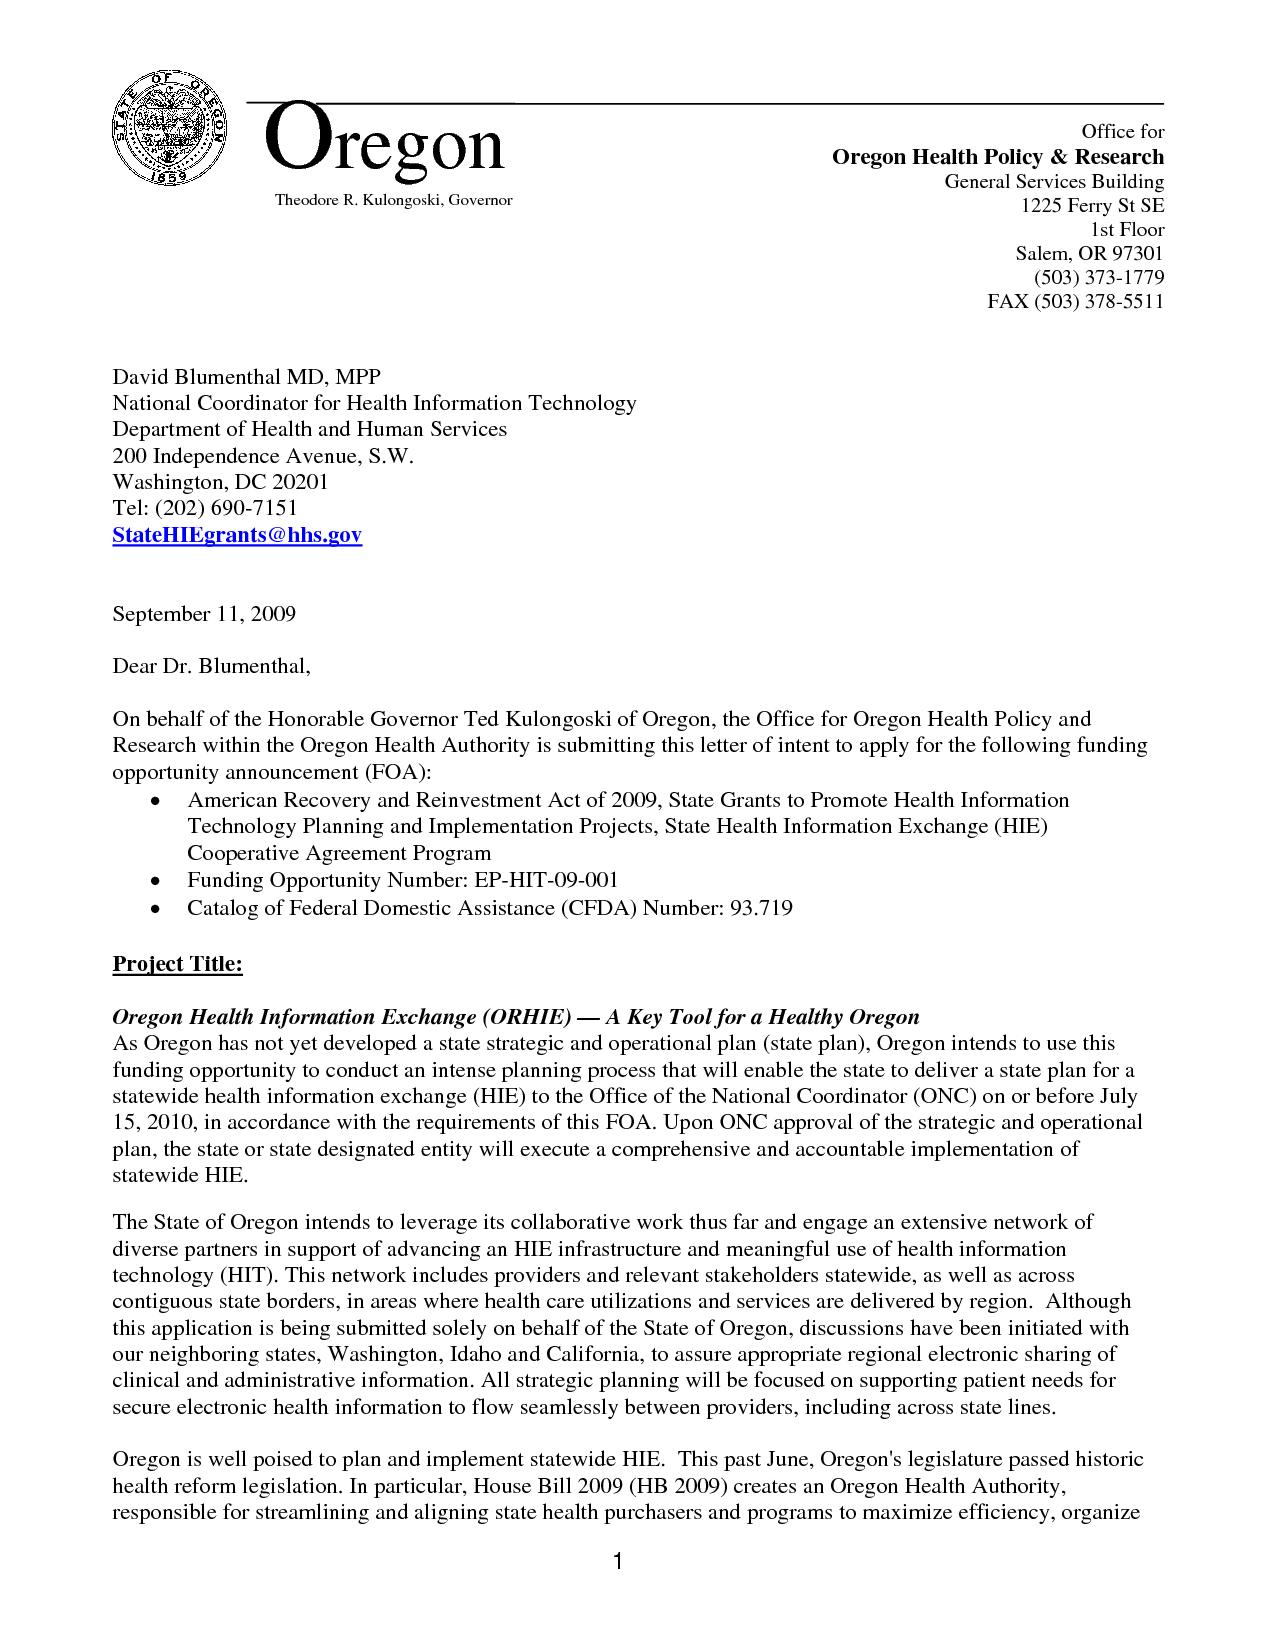 Sample business partnership letter example requesting home sample business partnership letter example requesting spiritdancerdesigns Images